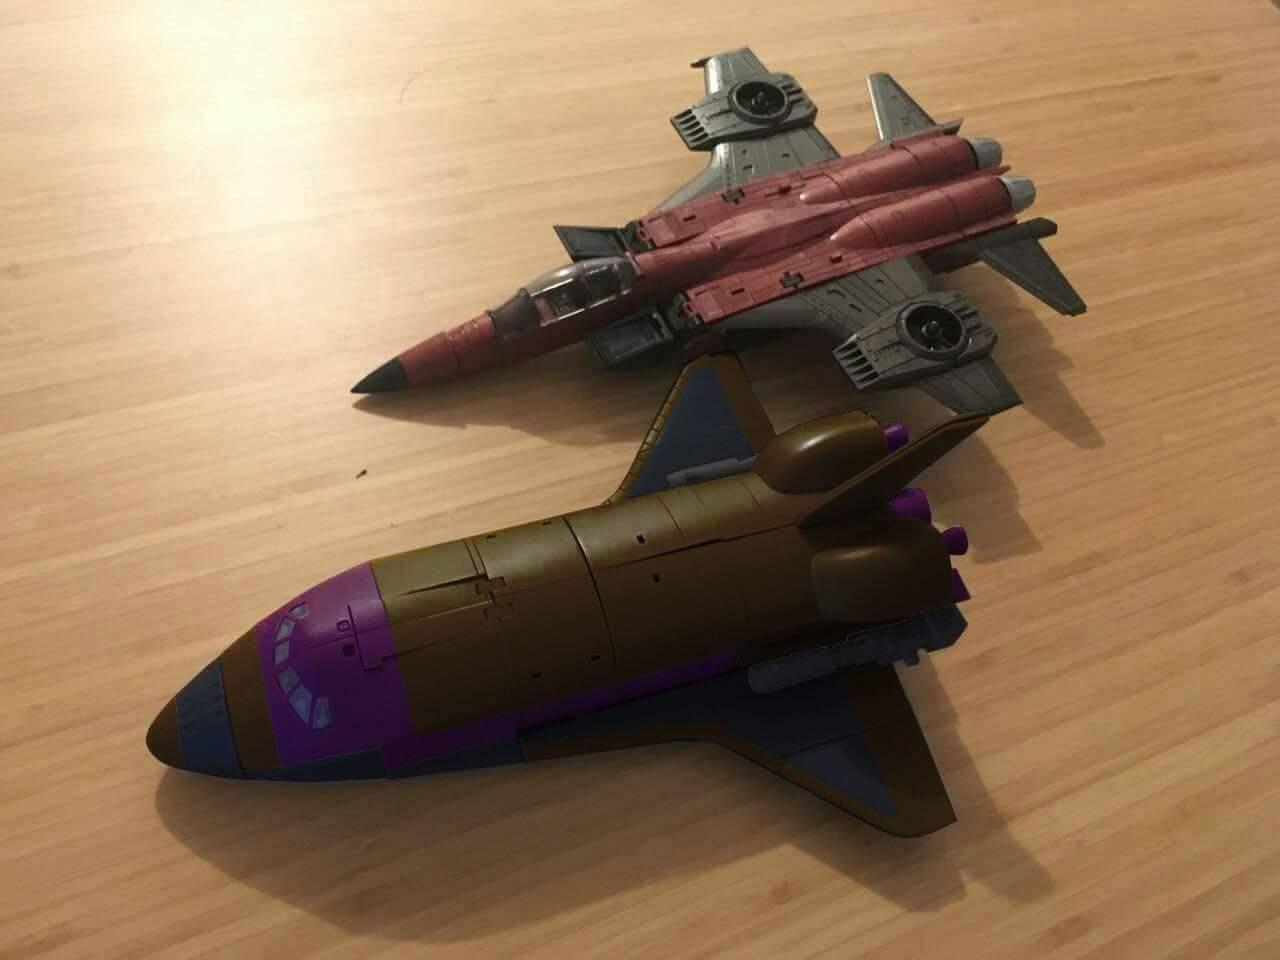 [Zeta Toys] Produit Tiers - Armageddon (ZA-01 à ZA-05) - ZA-06 Bruticon - ZA-07 Bruticon ― aka Bruticus (Studio OX, couleurs G1, métallique) 9Ouae3Ii